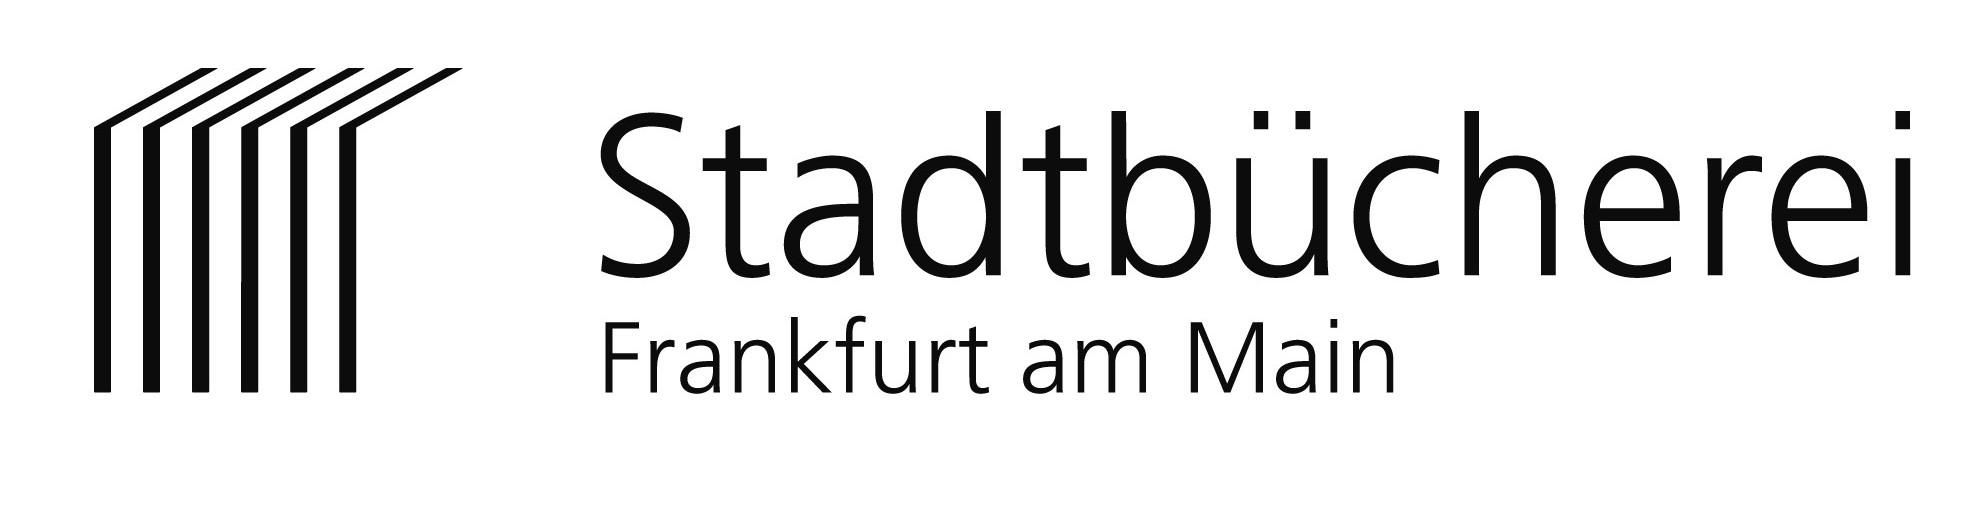 Logo Stadtbücherei Frankfurt Main